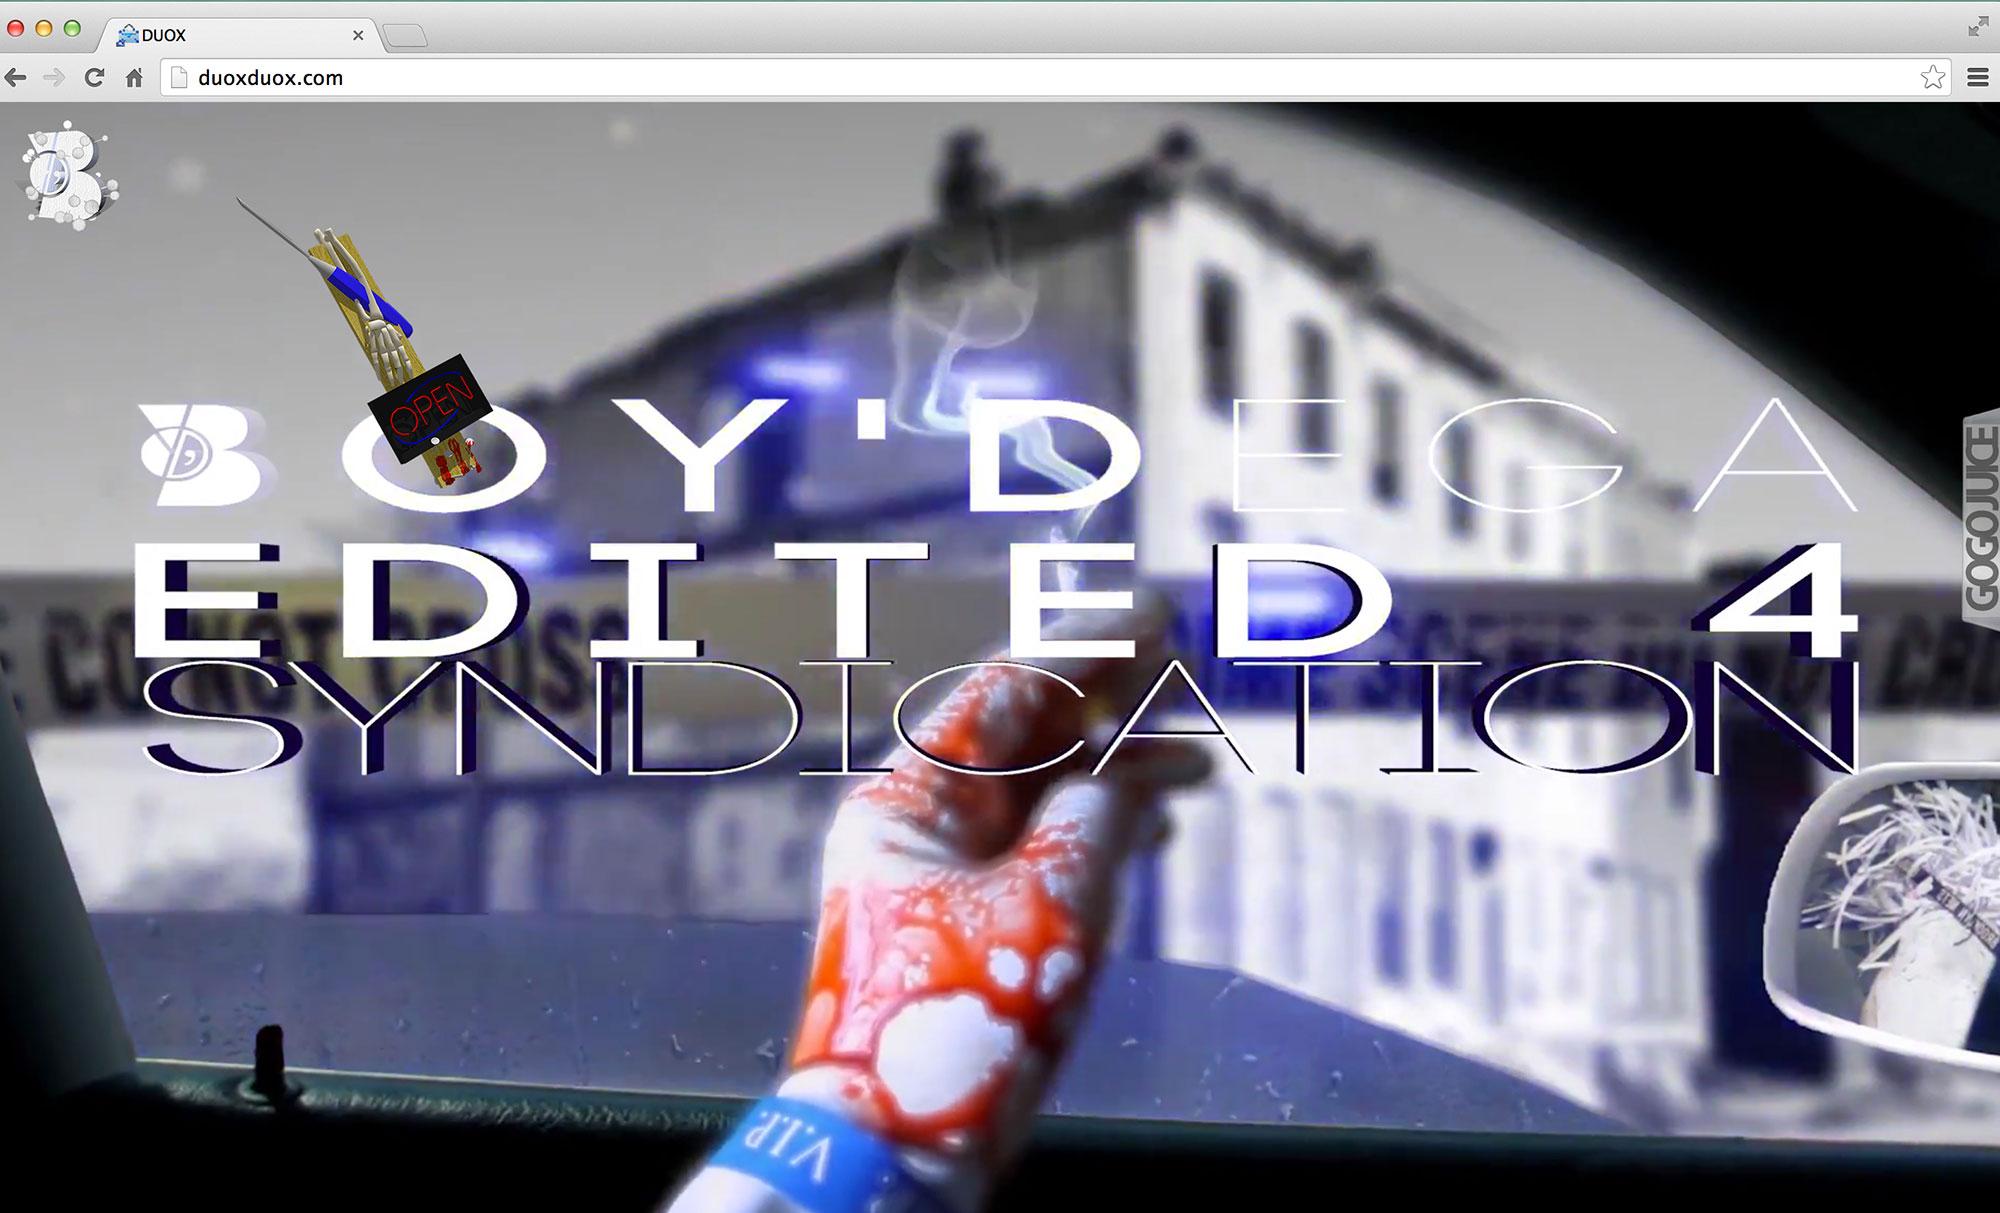 Wickerham & Lomax | BOY'Dega Season 1: Edited4Syndication